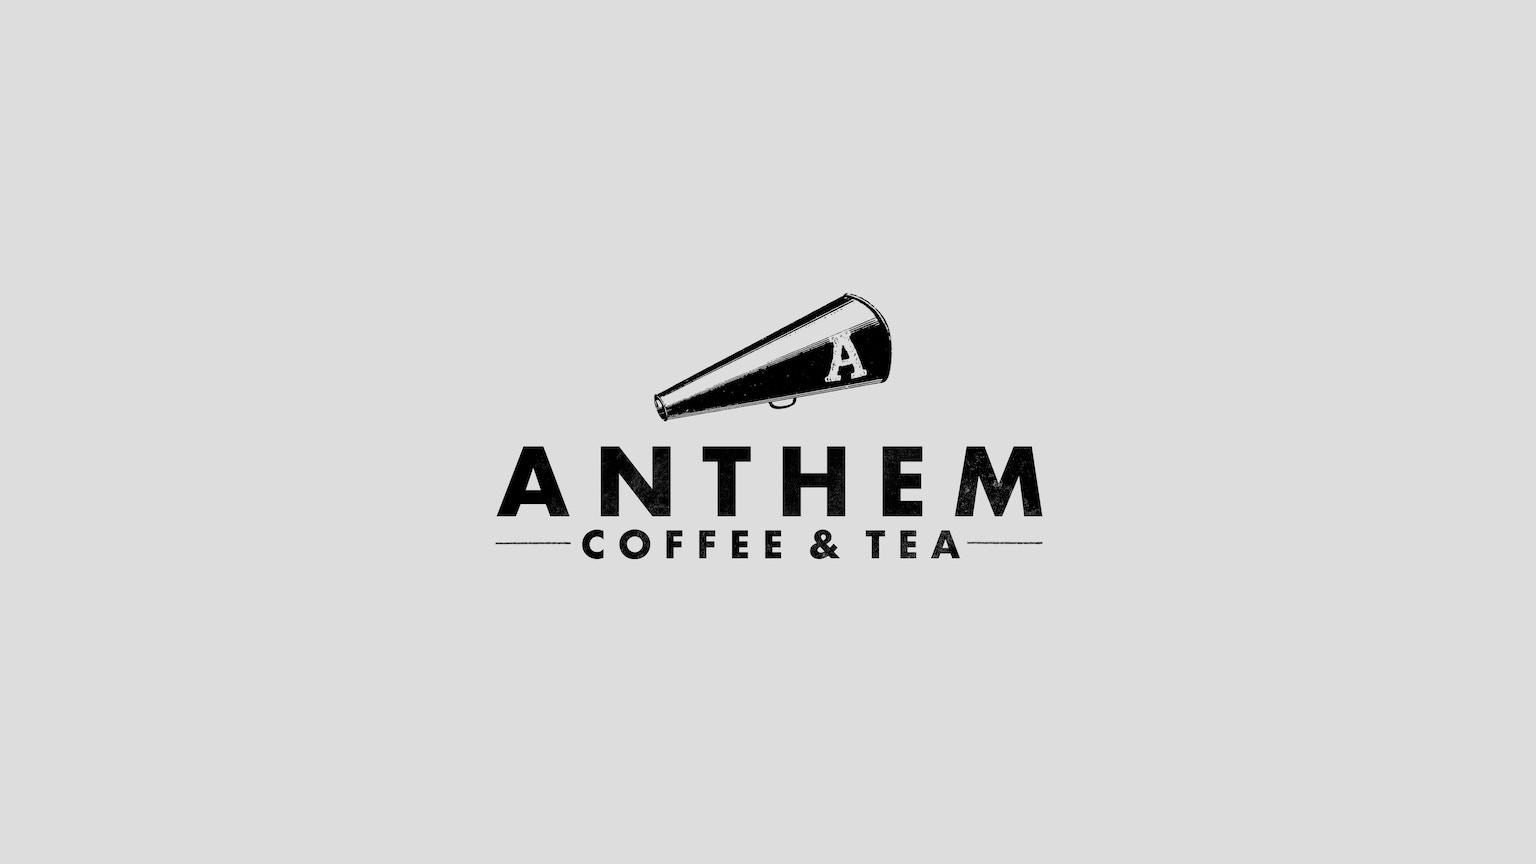 Anthem Coffee & Tea Expansion by Bryan Reynolds —Kickstarter